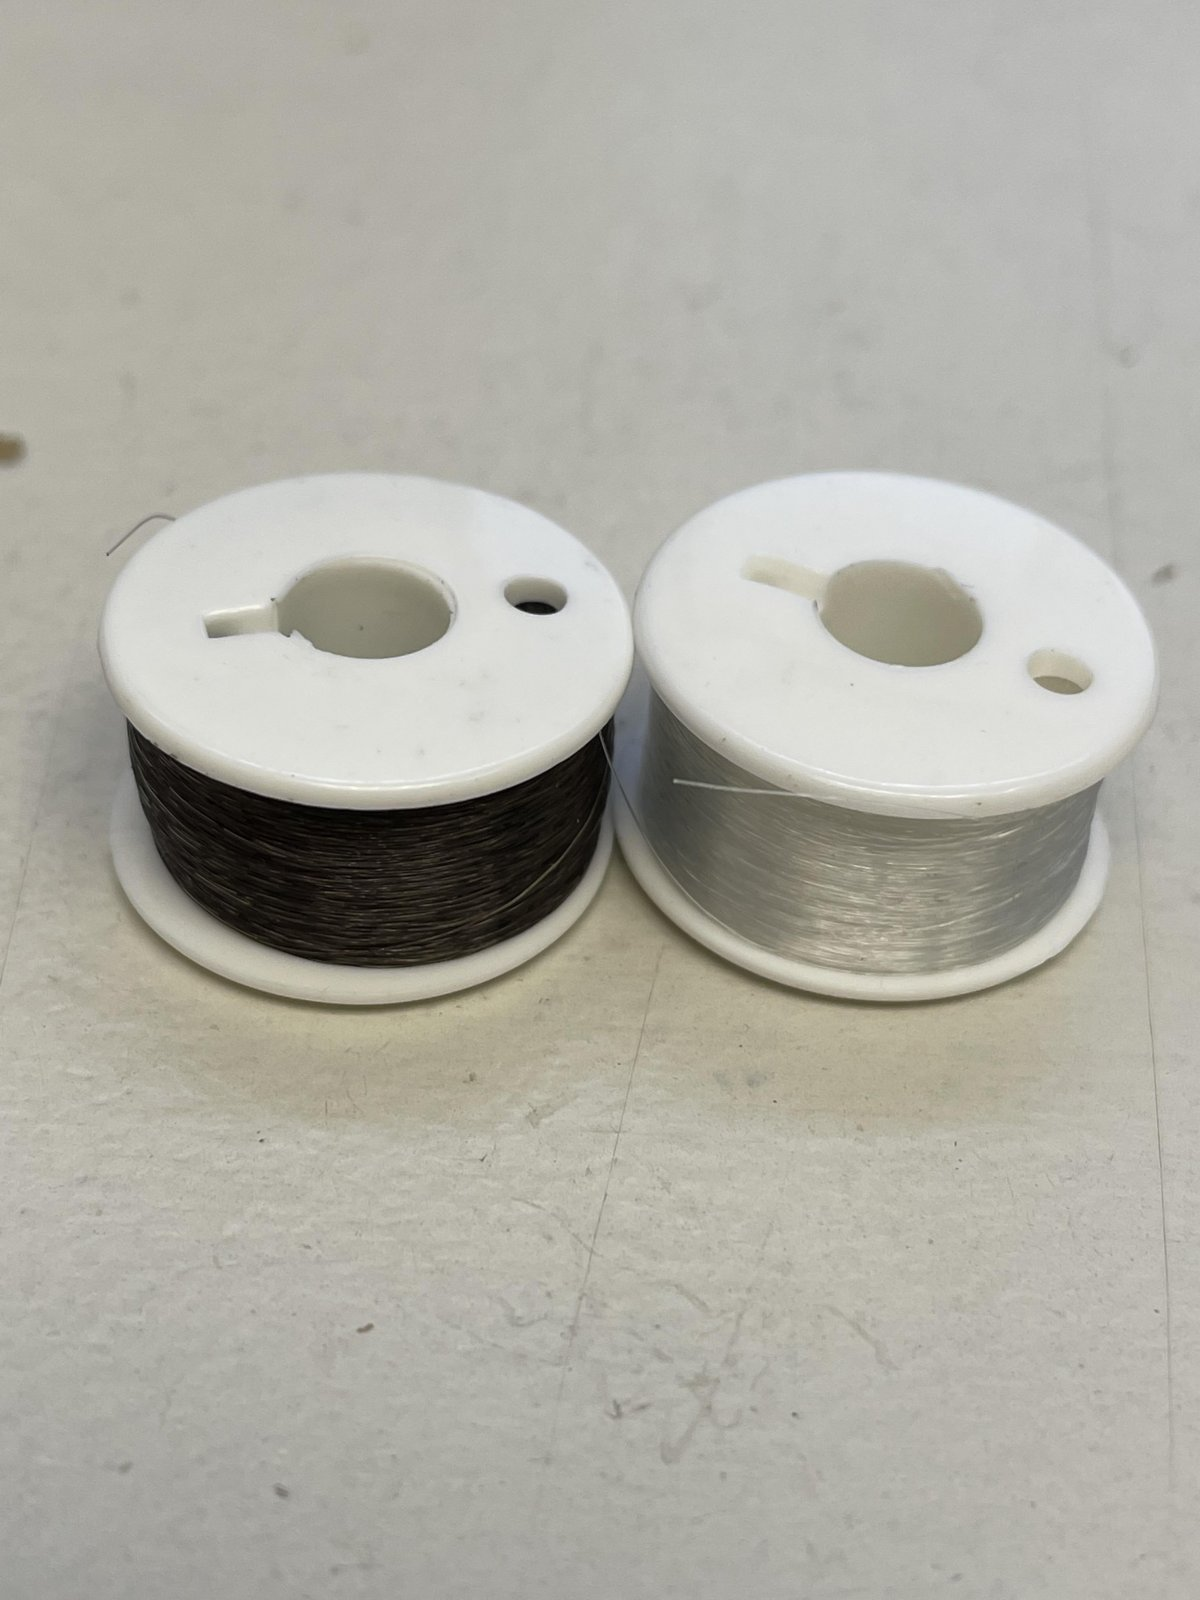 Superior Threads Mono Poly Combo Class 15 Pre-Wound Bobbins (1 Smoke & 1 Clear)